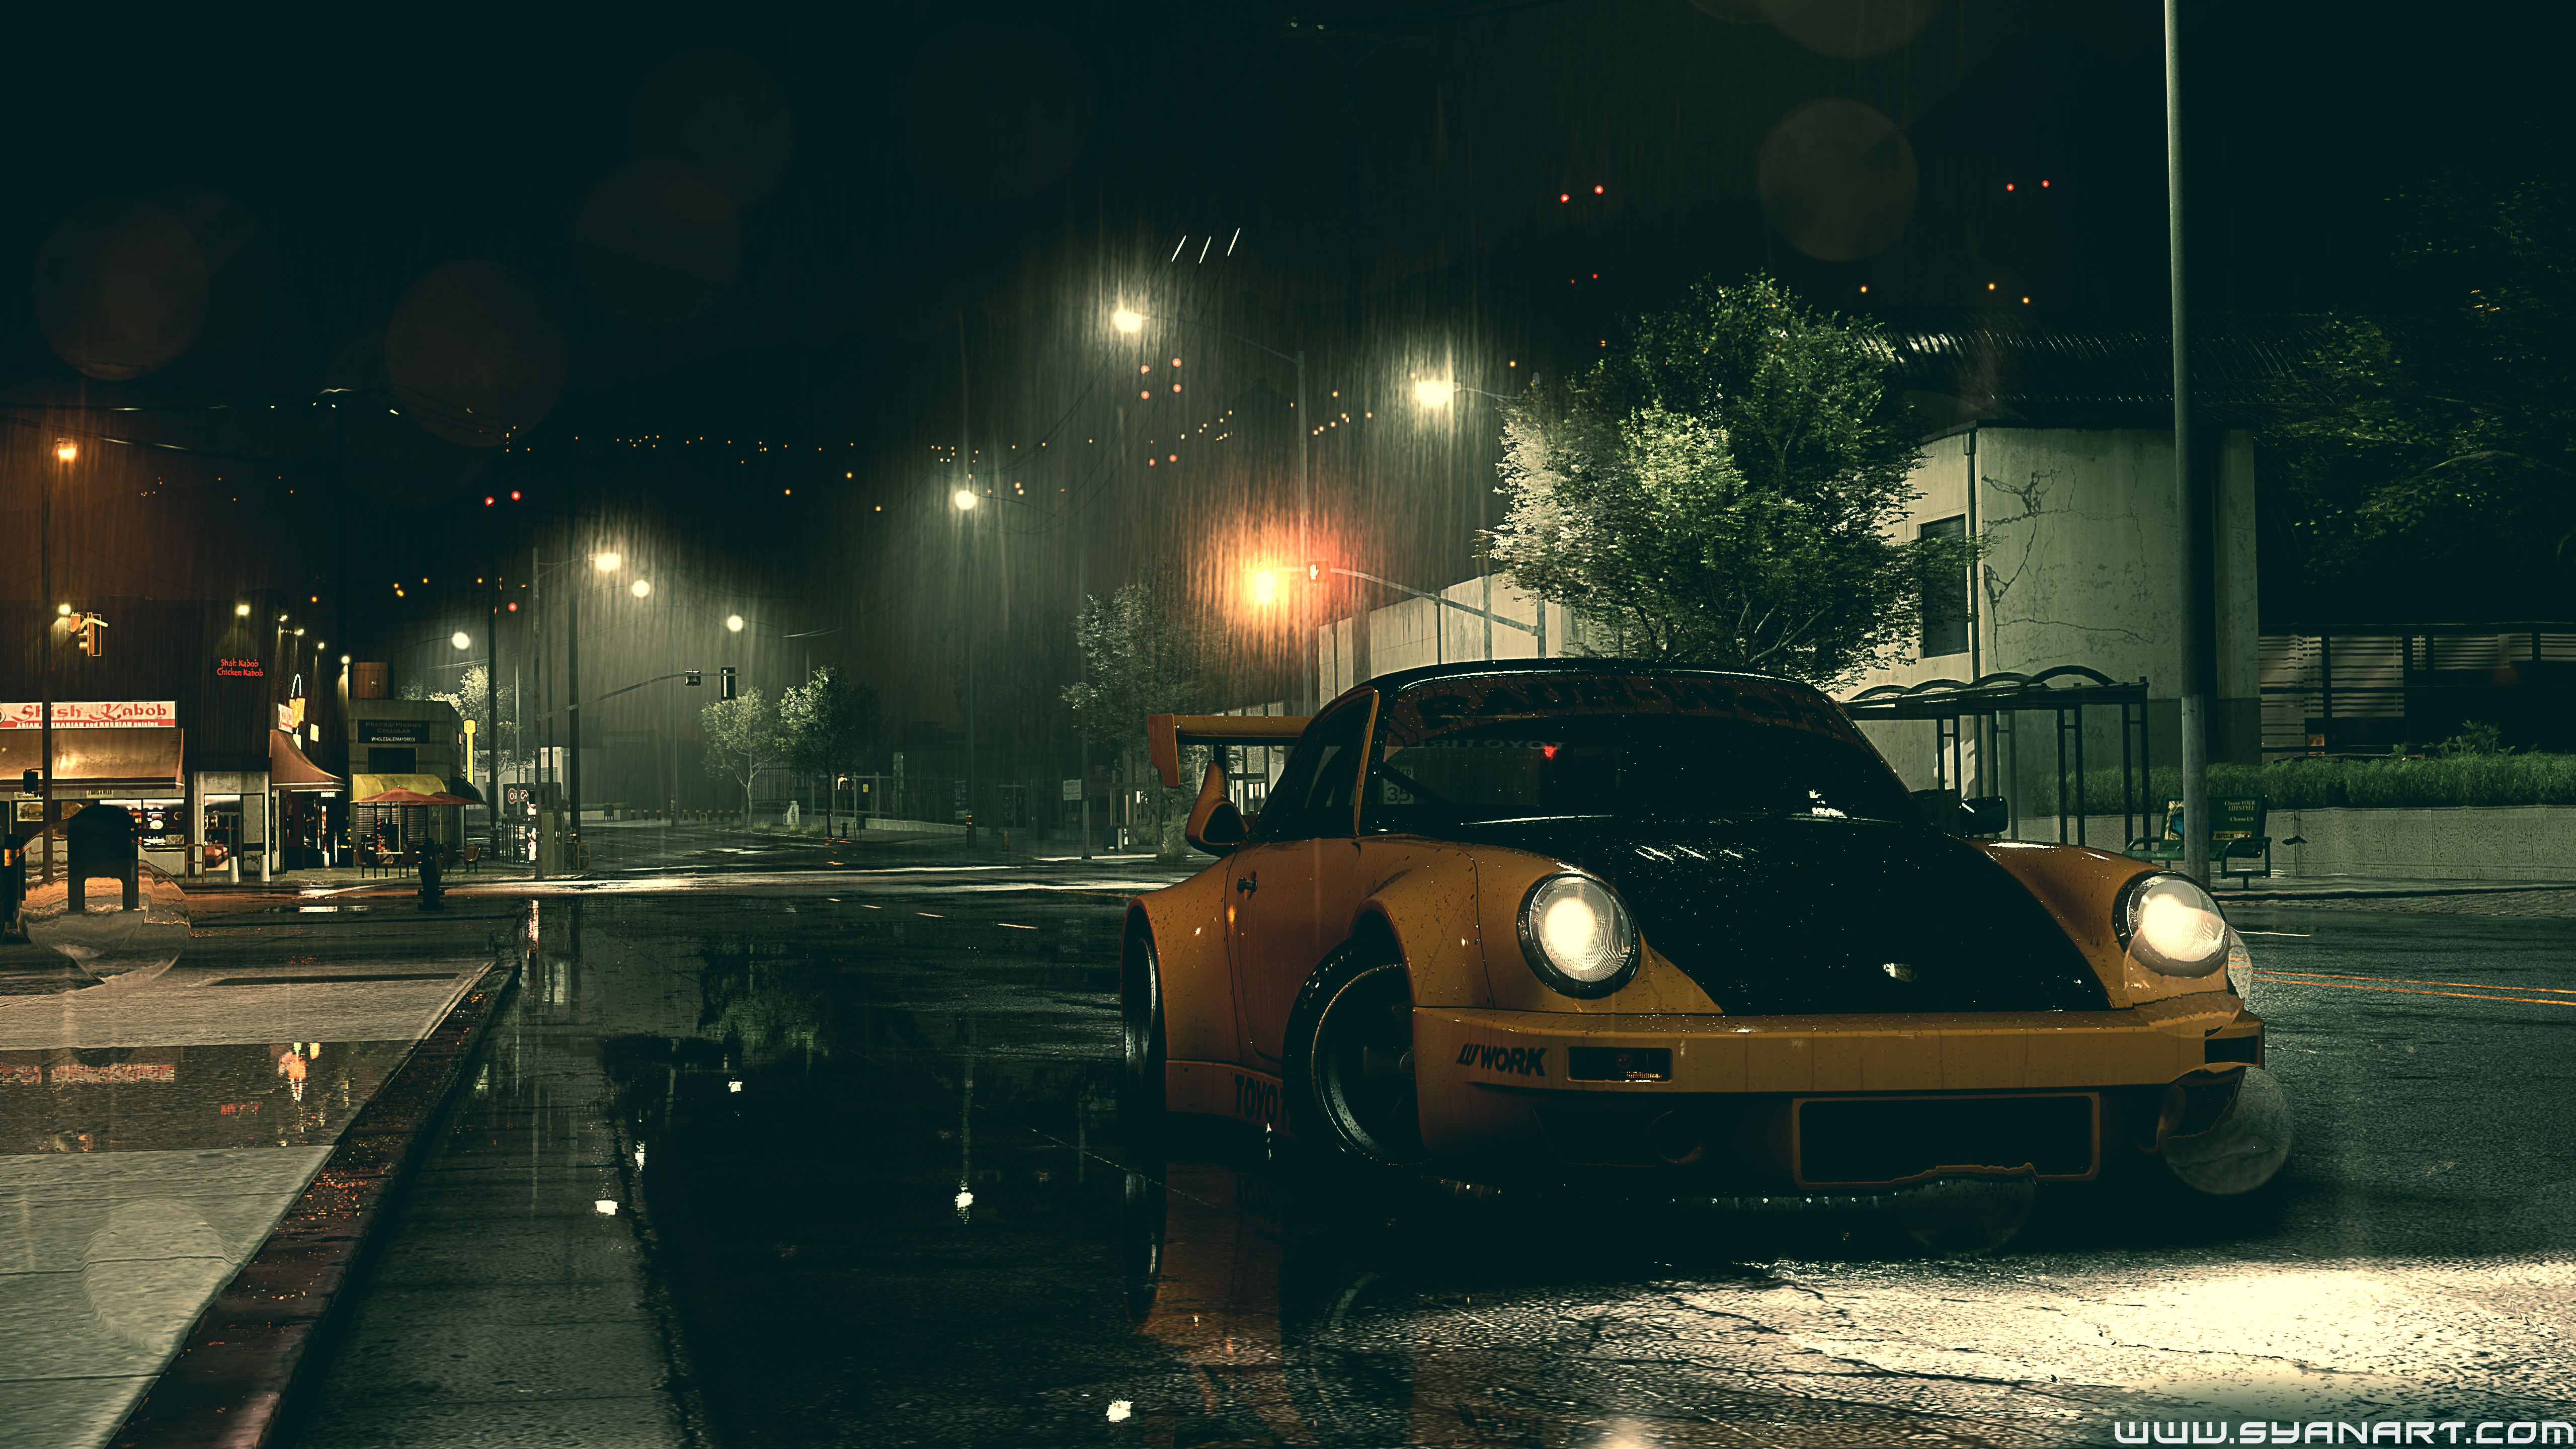 Need For Speed 2016 5k Desktop Gaming Background Syanart Station